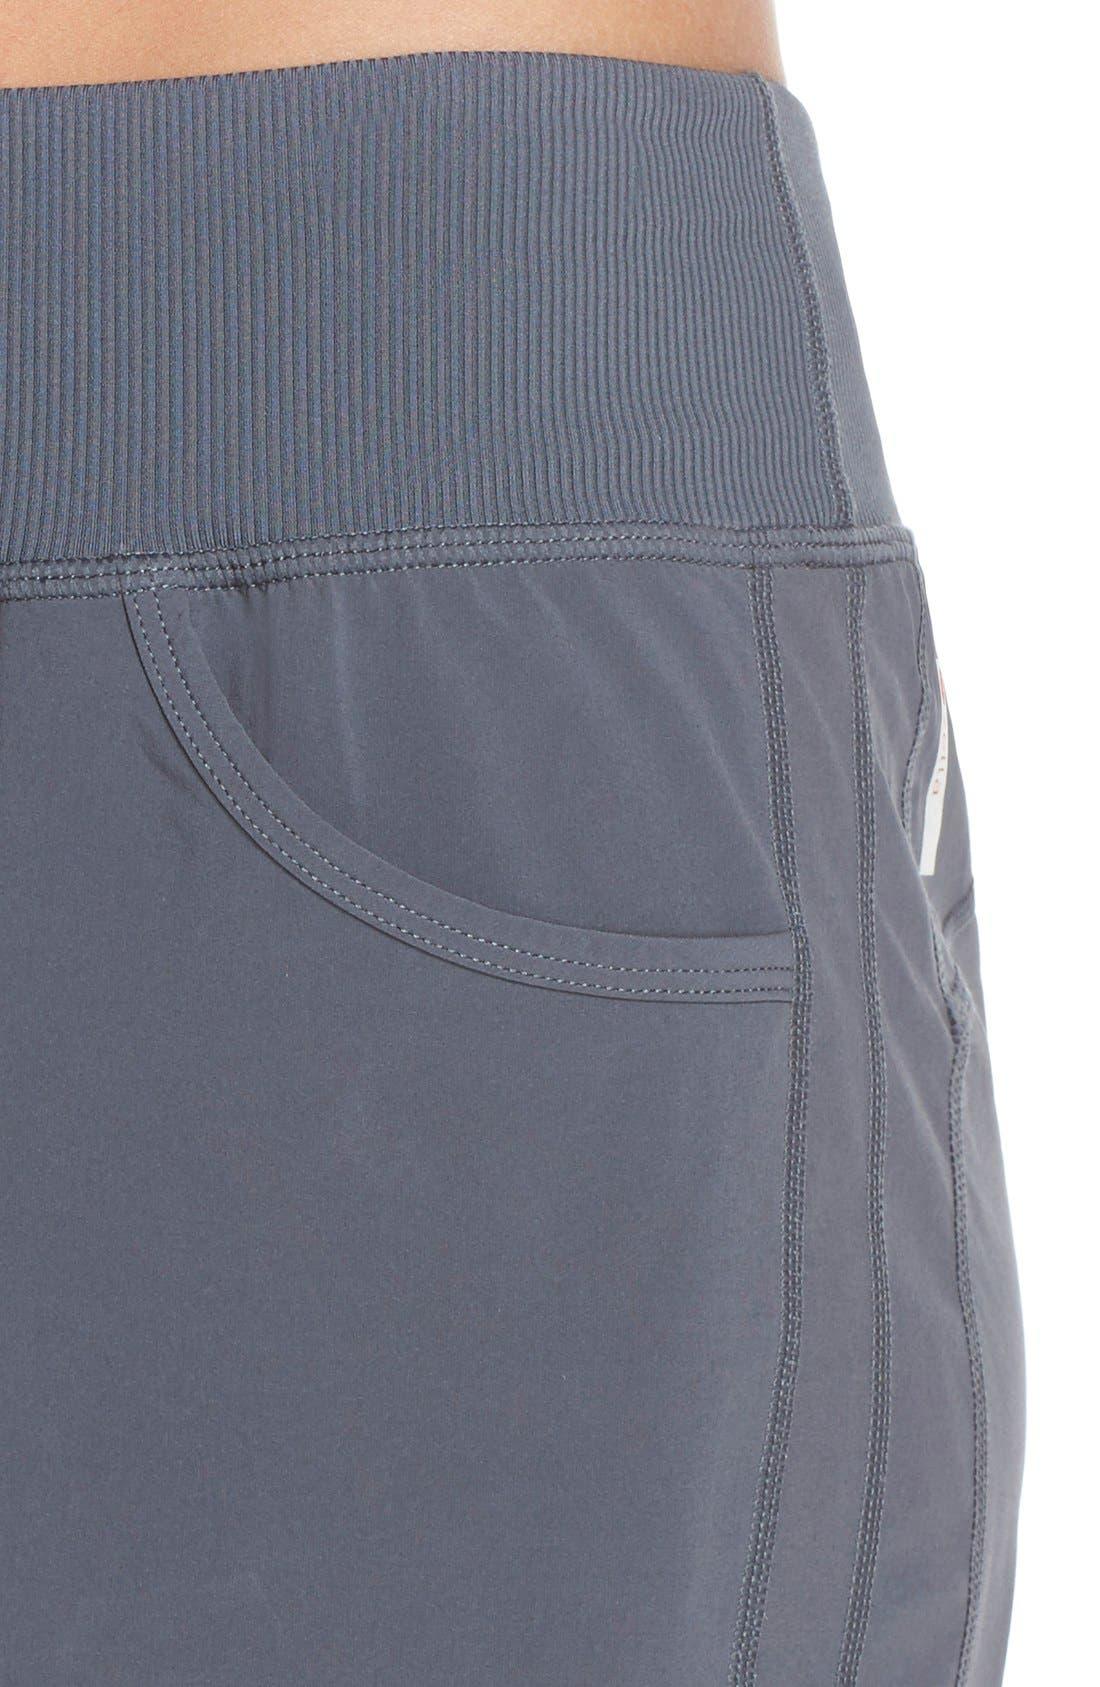 Alternate Image 4  - Zella 'City' Shorts (Online Only)